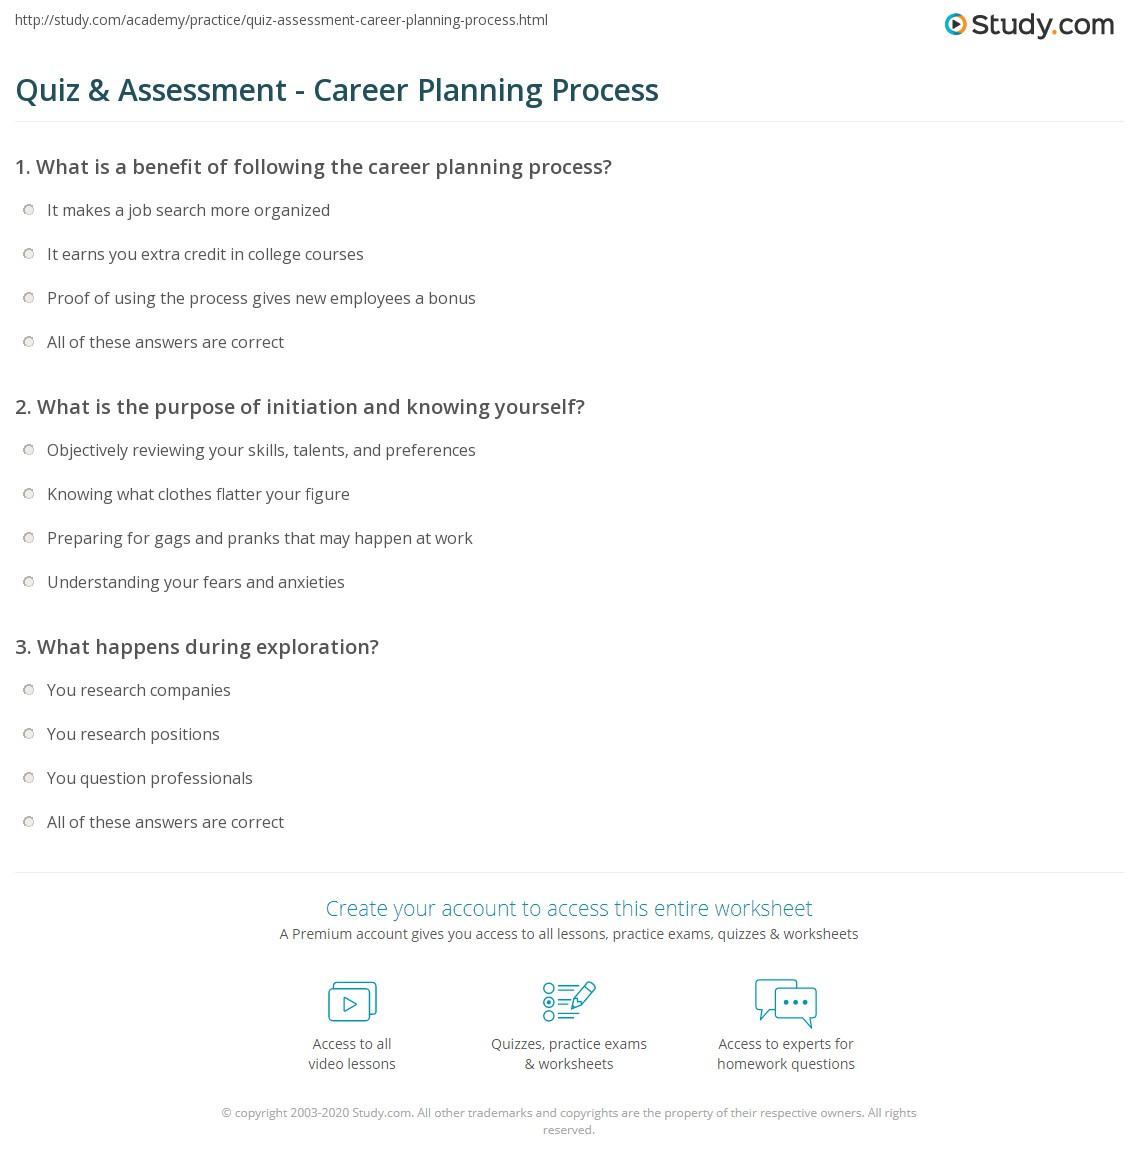 quiz assessment career planning process com print steps in the career planning process worksheet